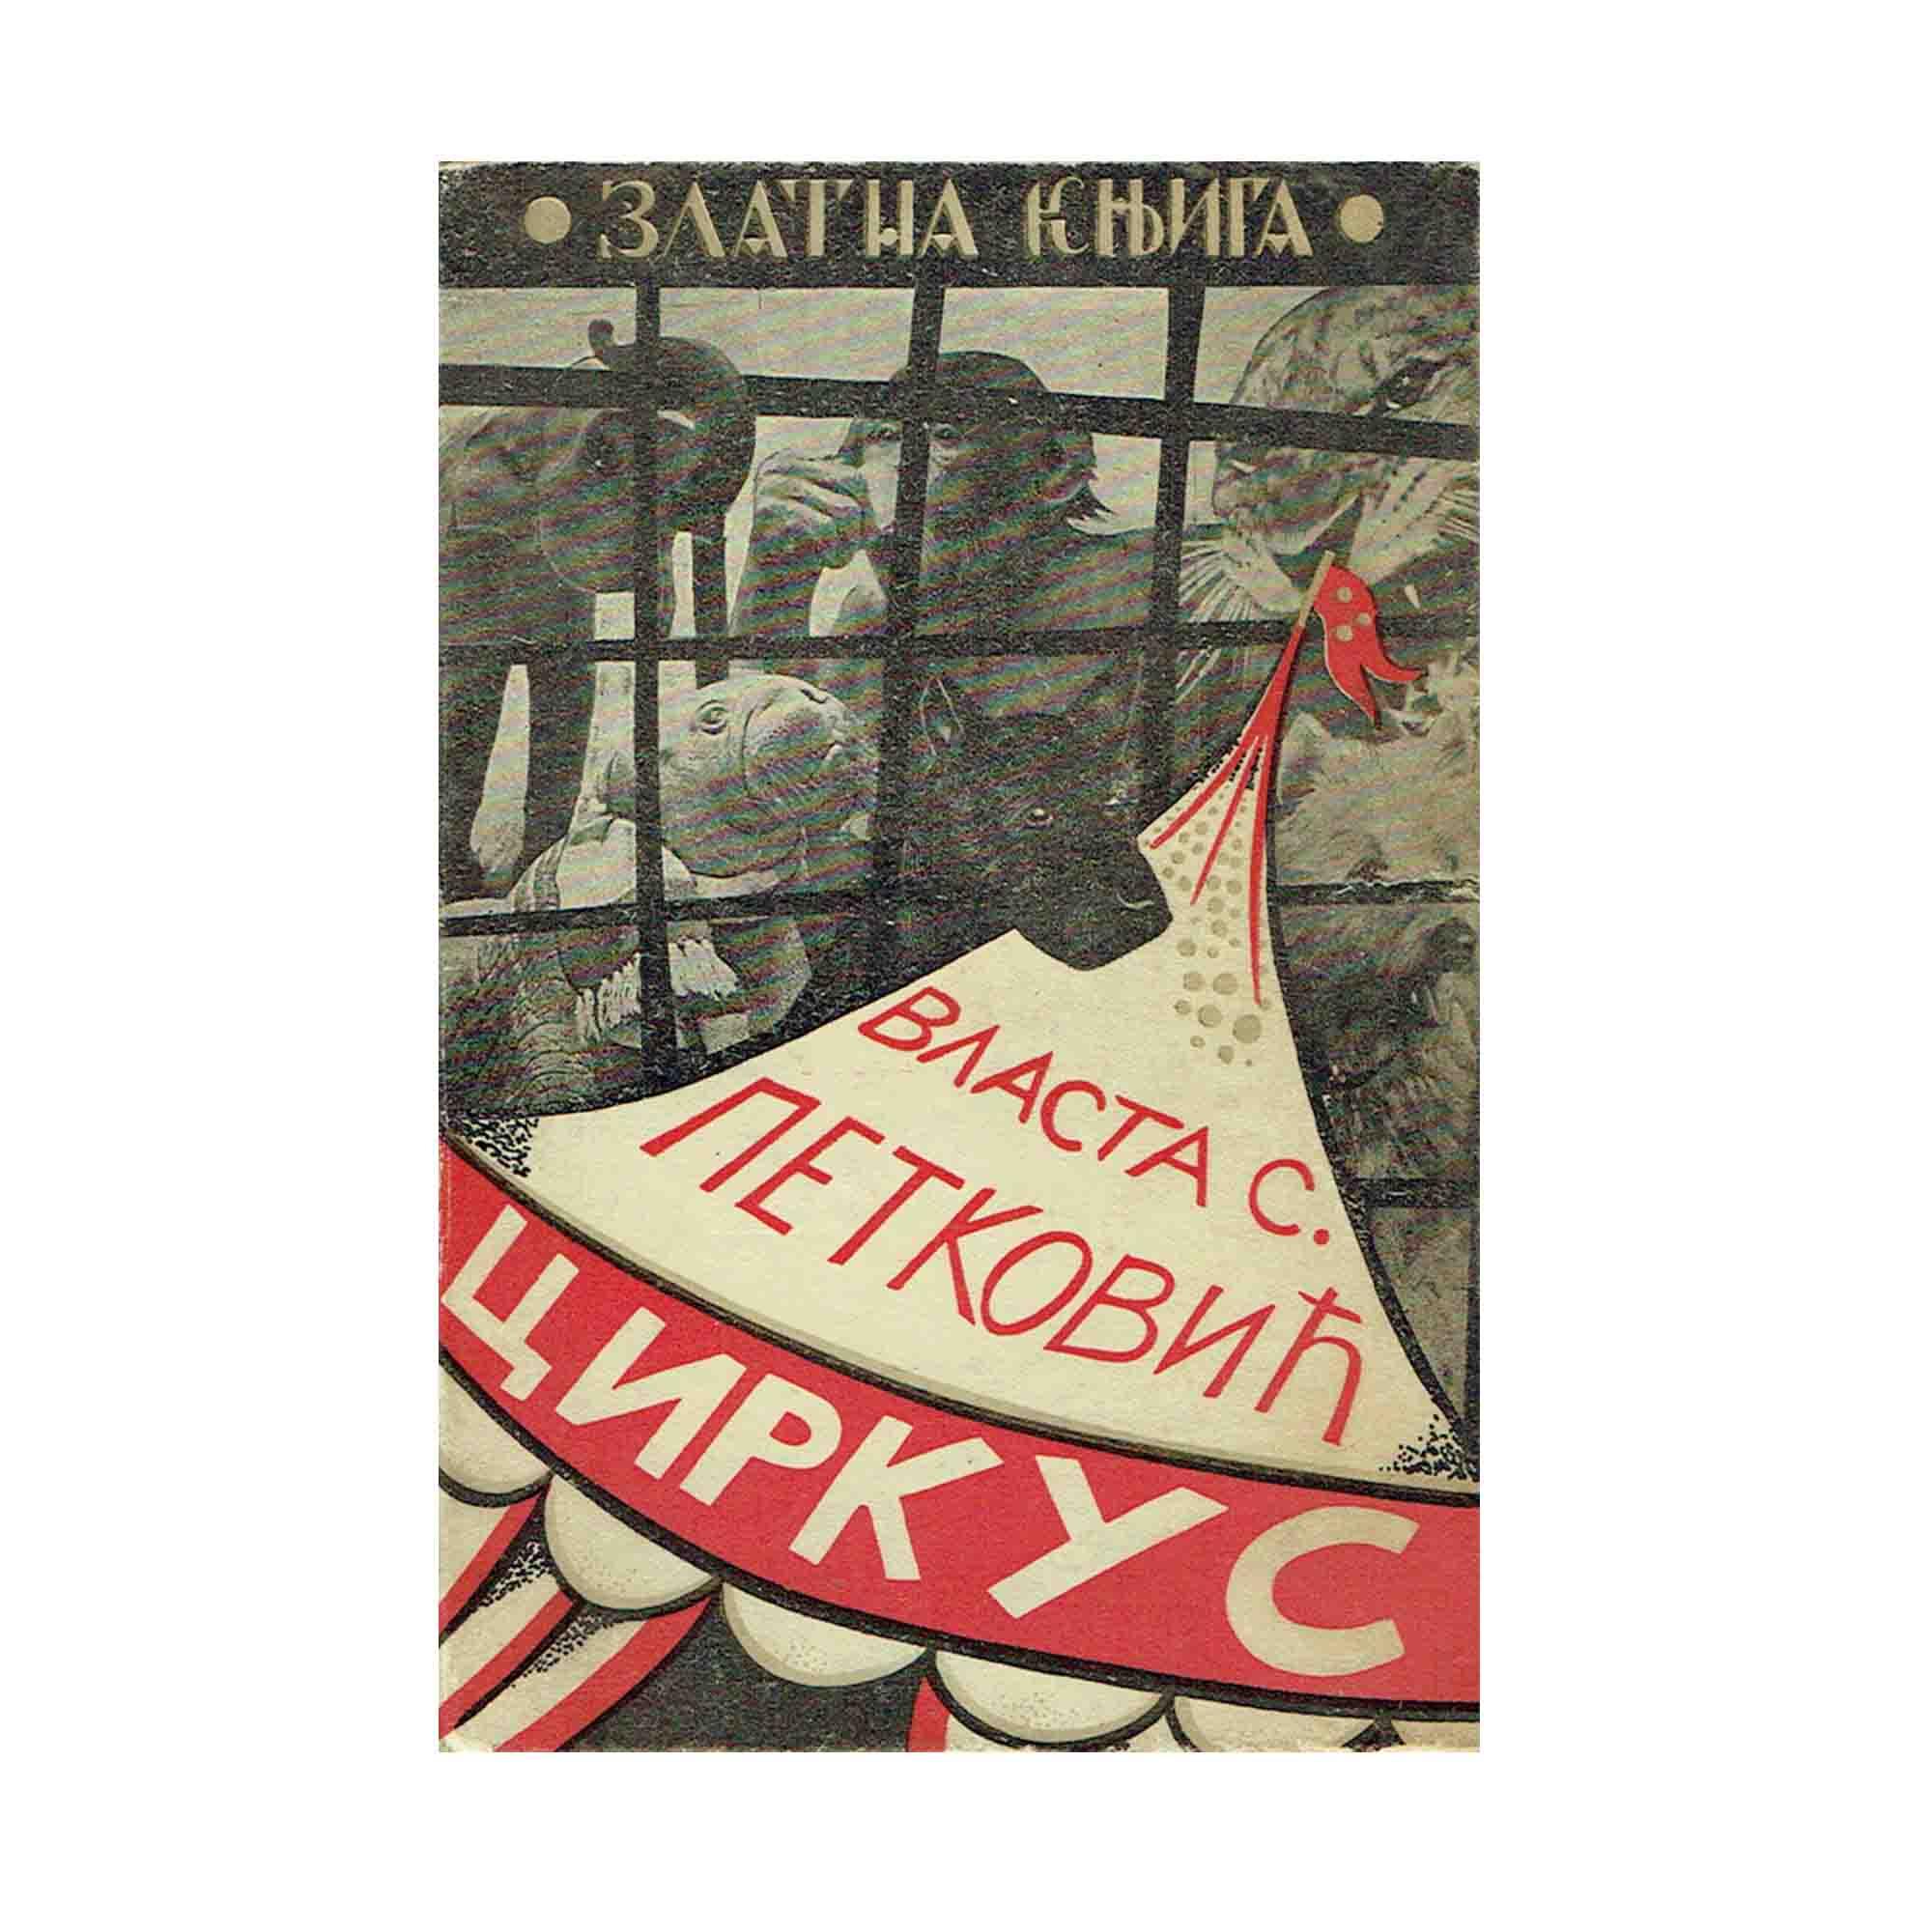 5325-Zendrinski-Petkovic-Cirkus-1933-Ausschnitt-N.jpg